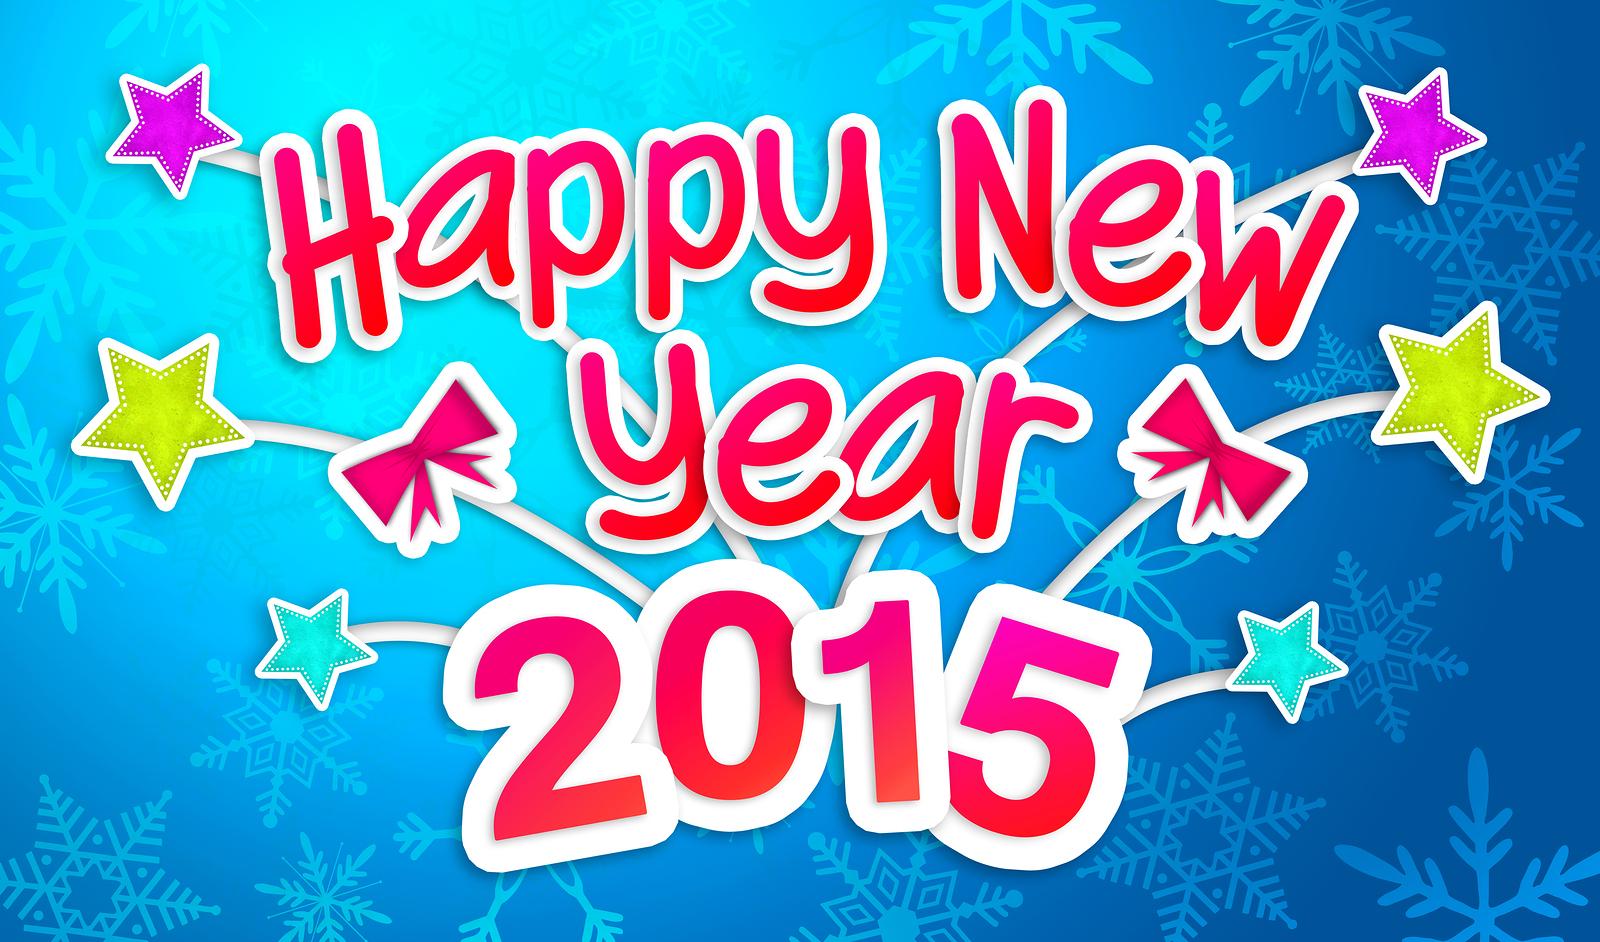 Happy New Year 2015 Event Wallpaper HD Wallpaper WallpaperLepi 1600x942